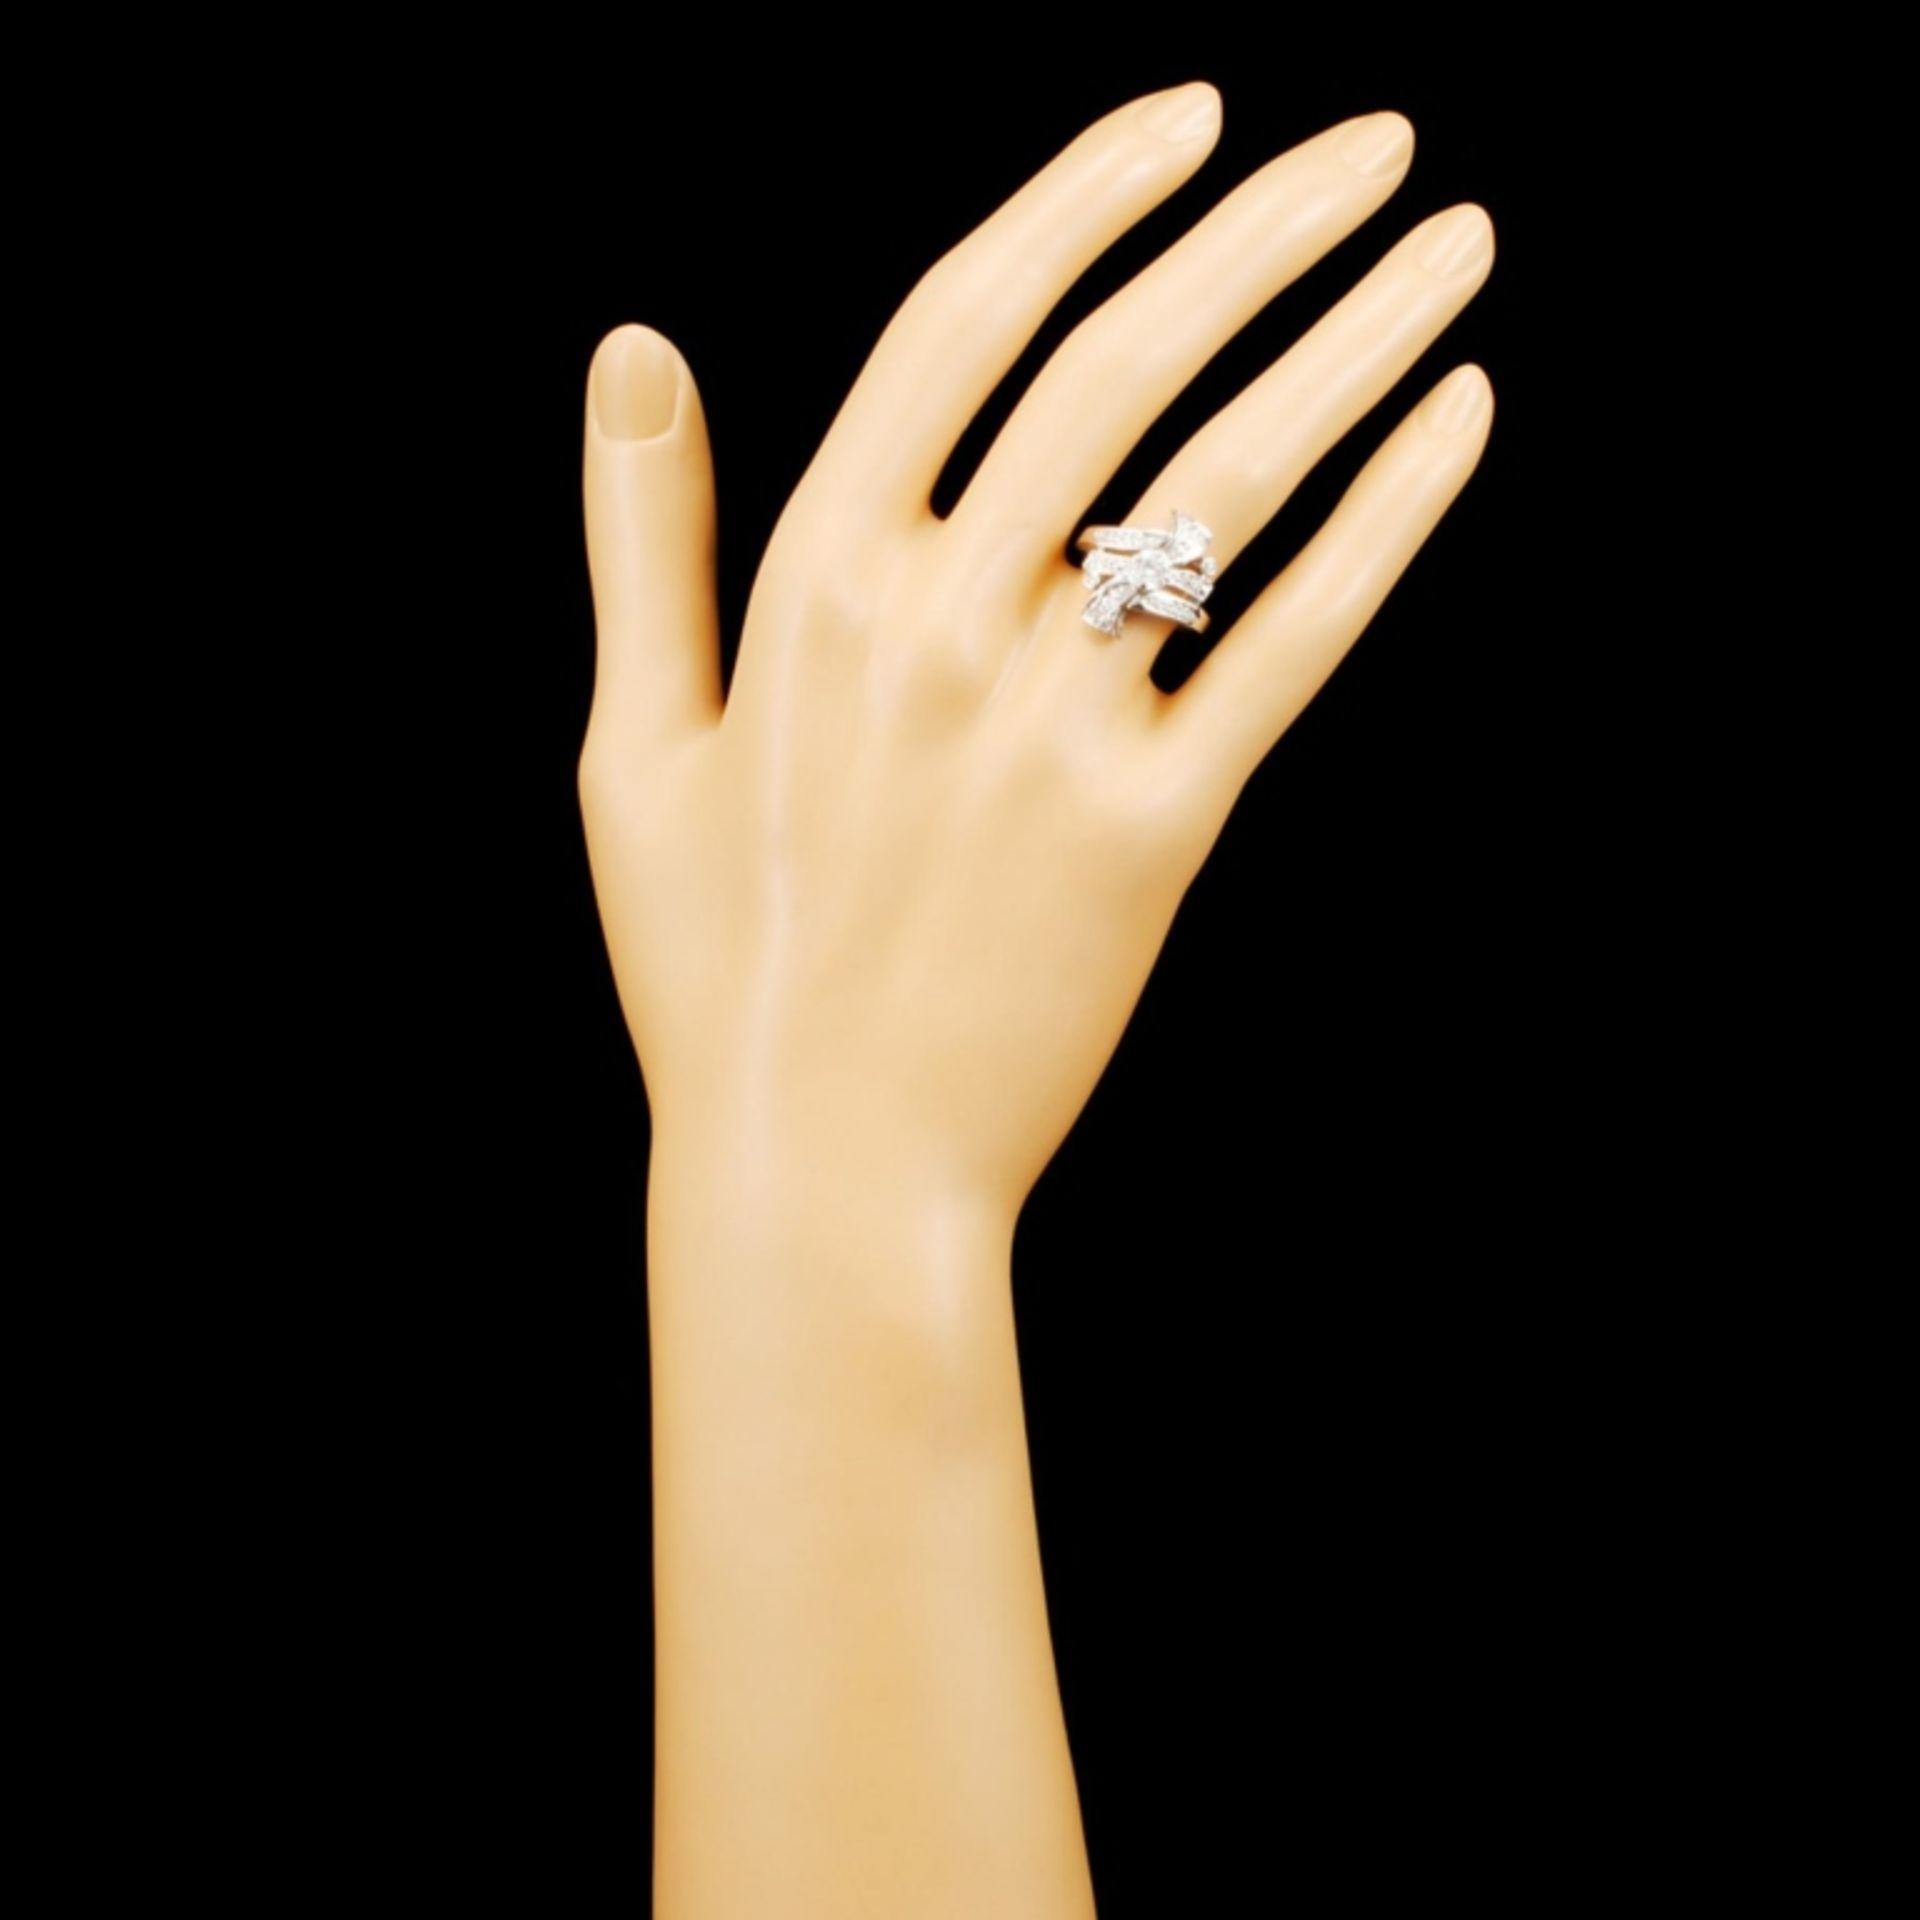 14K Gold 0.85ctw Diamond Ring - Image 4 of 5